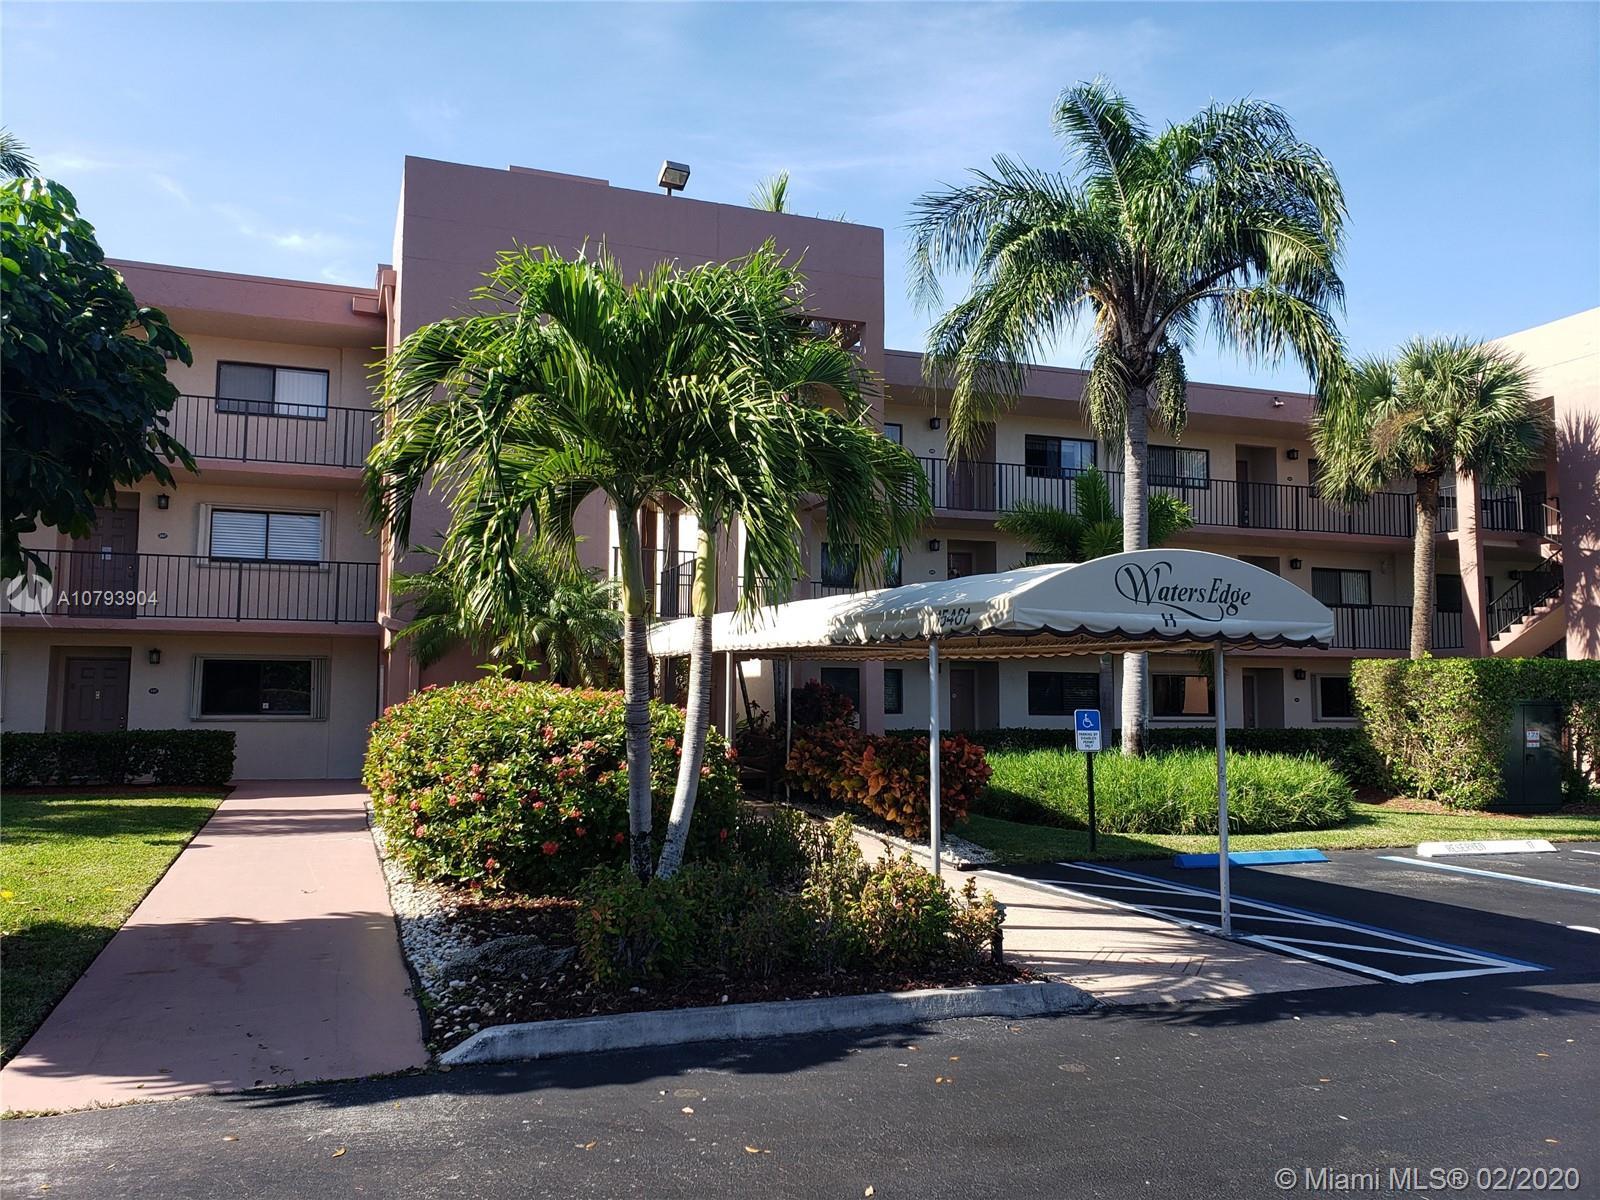 15461 Pembridge Dr 211, Delray Beach, FL 33484